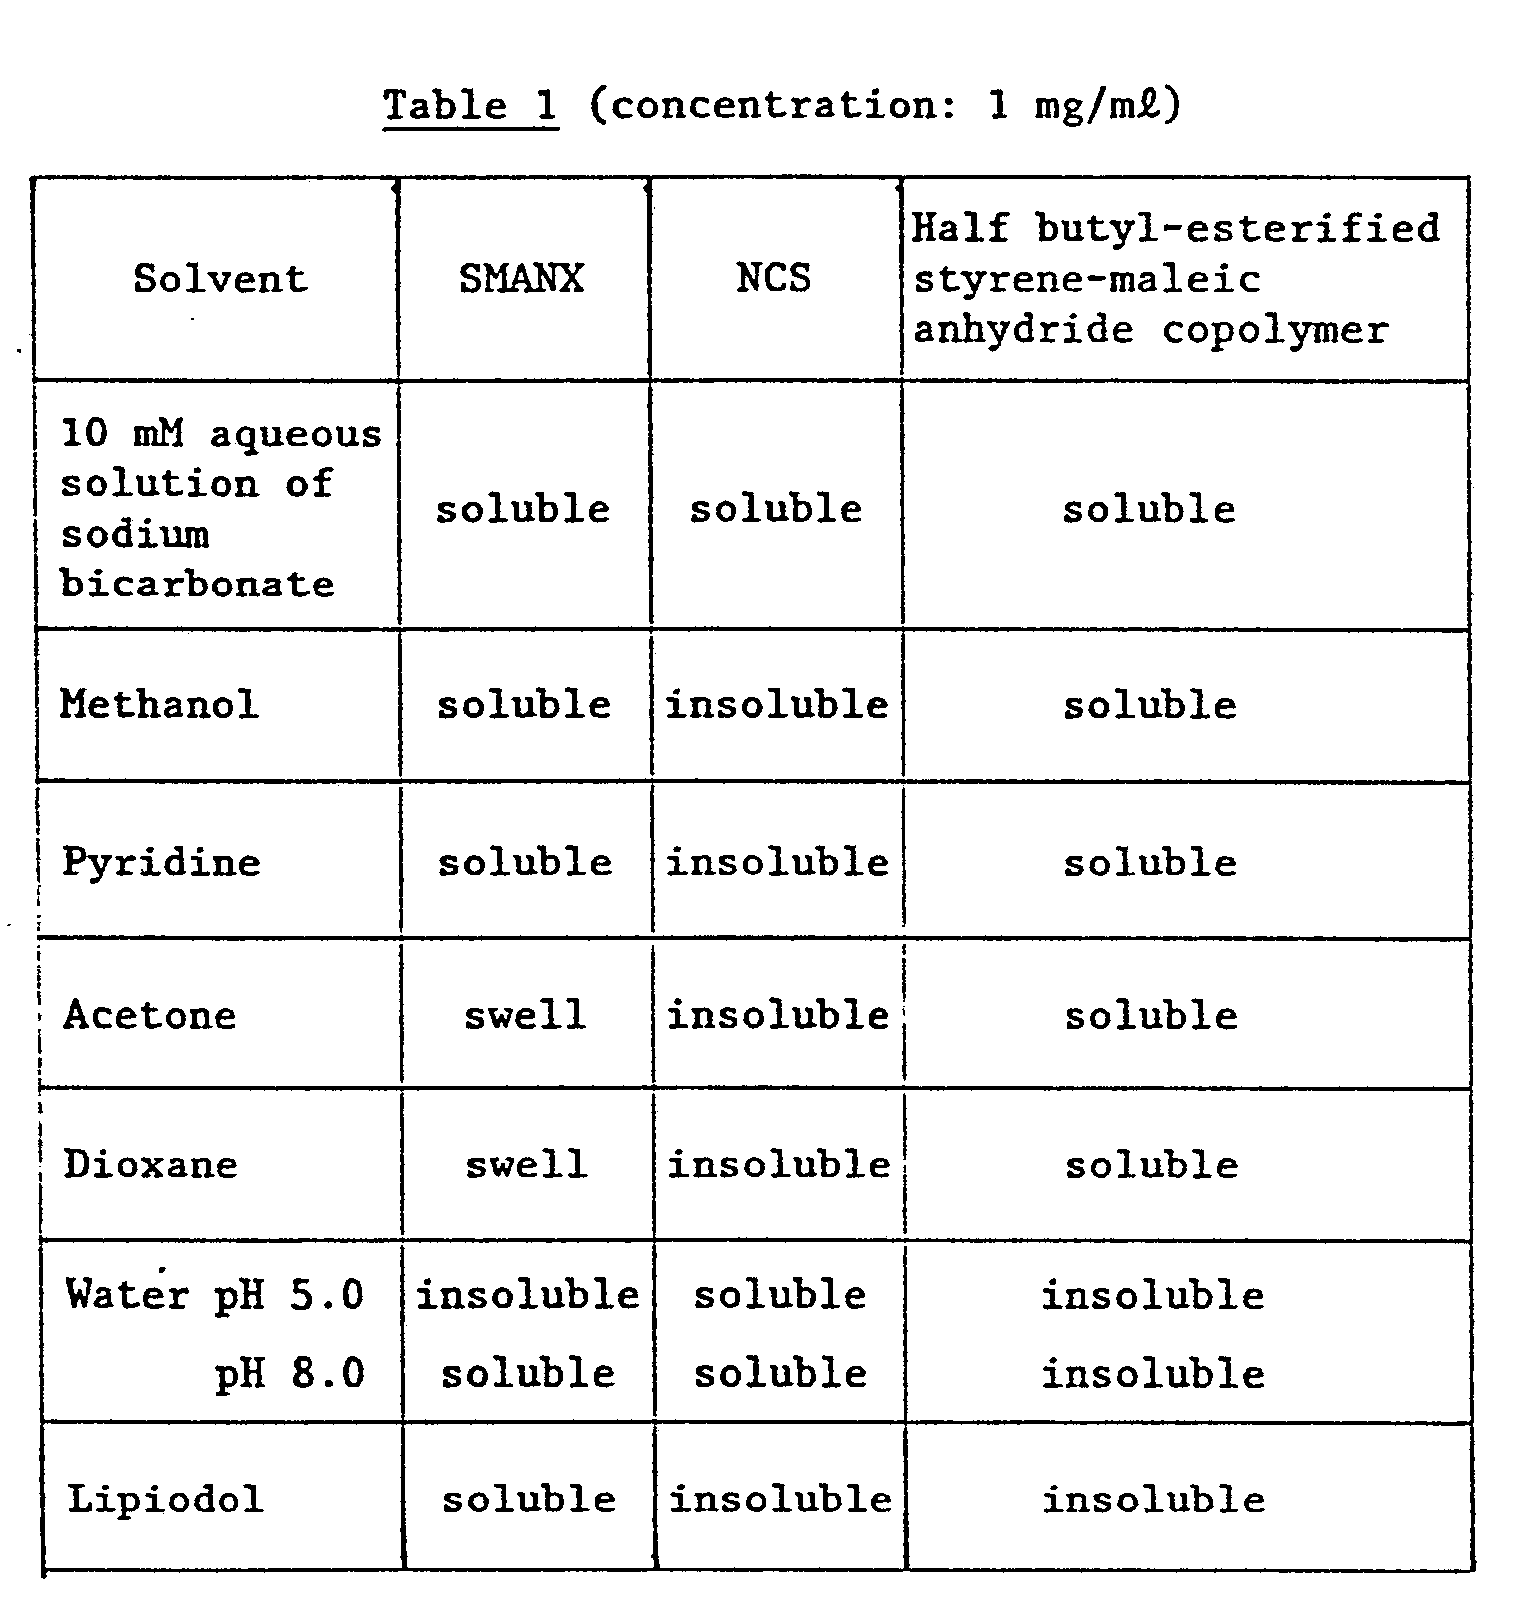 EP0087957A1 - Neocarzinostatin complexes, a method for